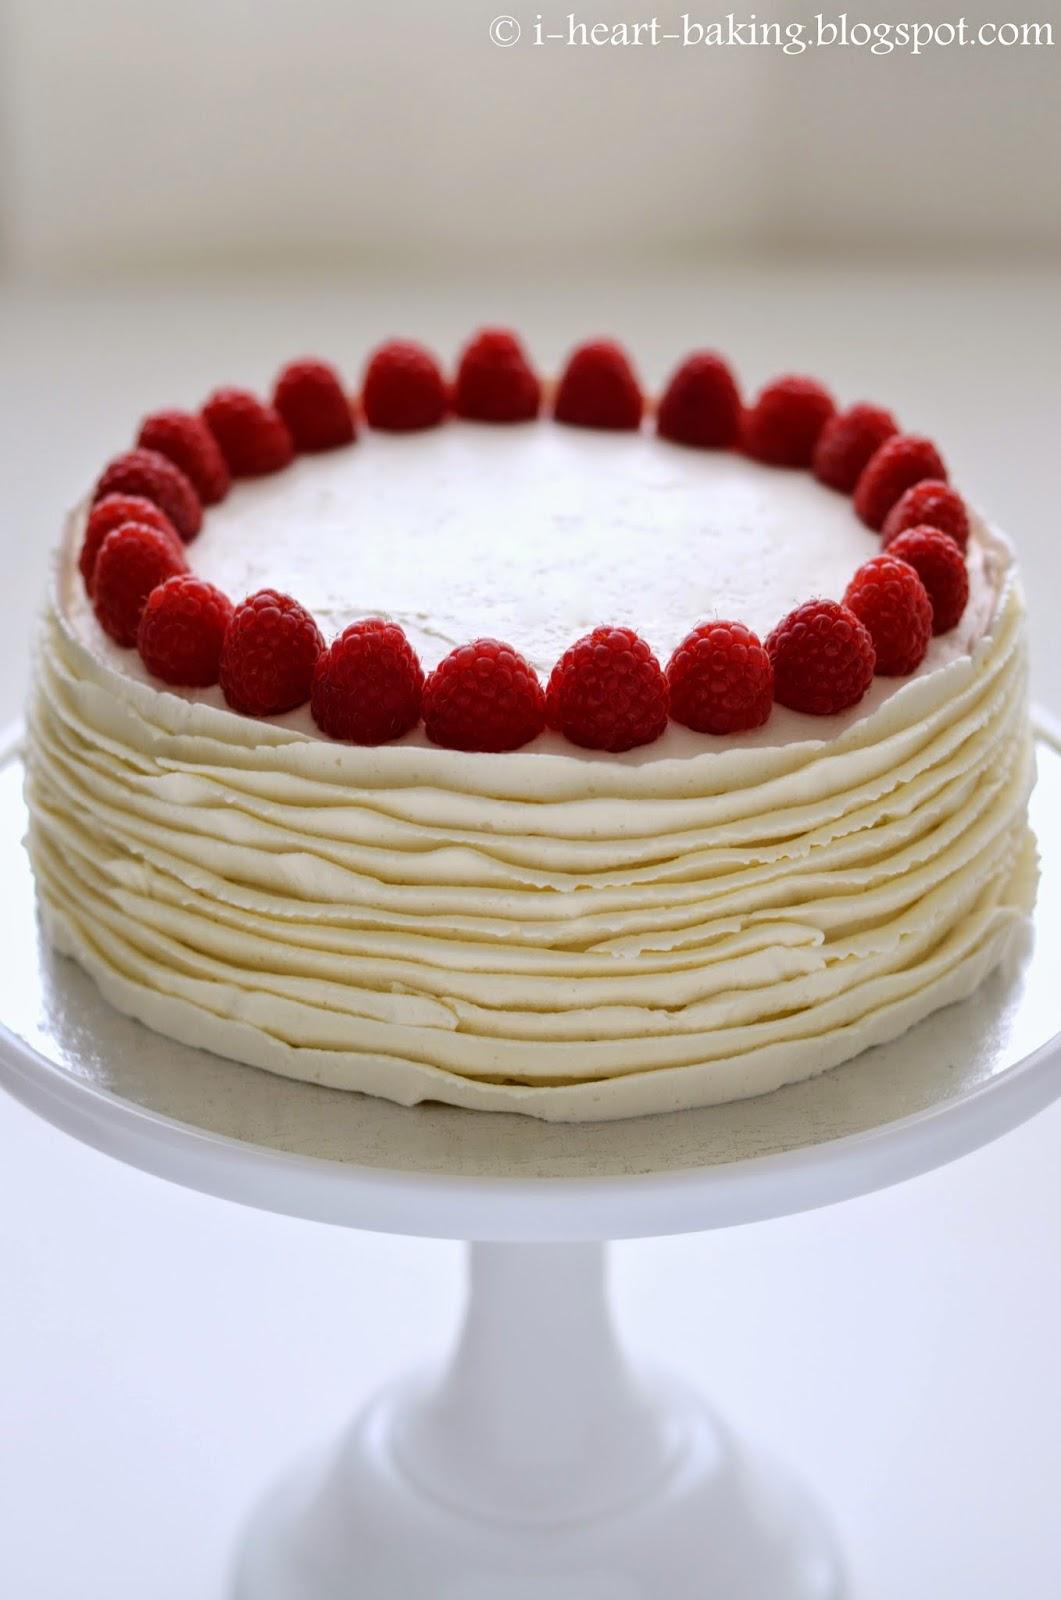 i heart baking!: japanese cheesecake with whipped cream ...